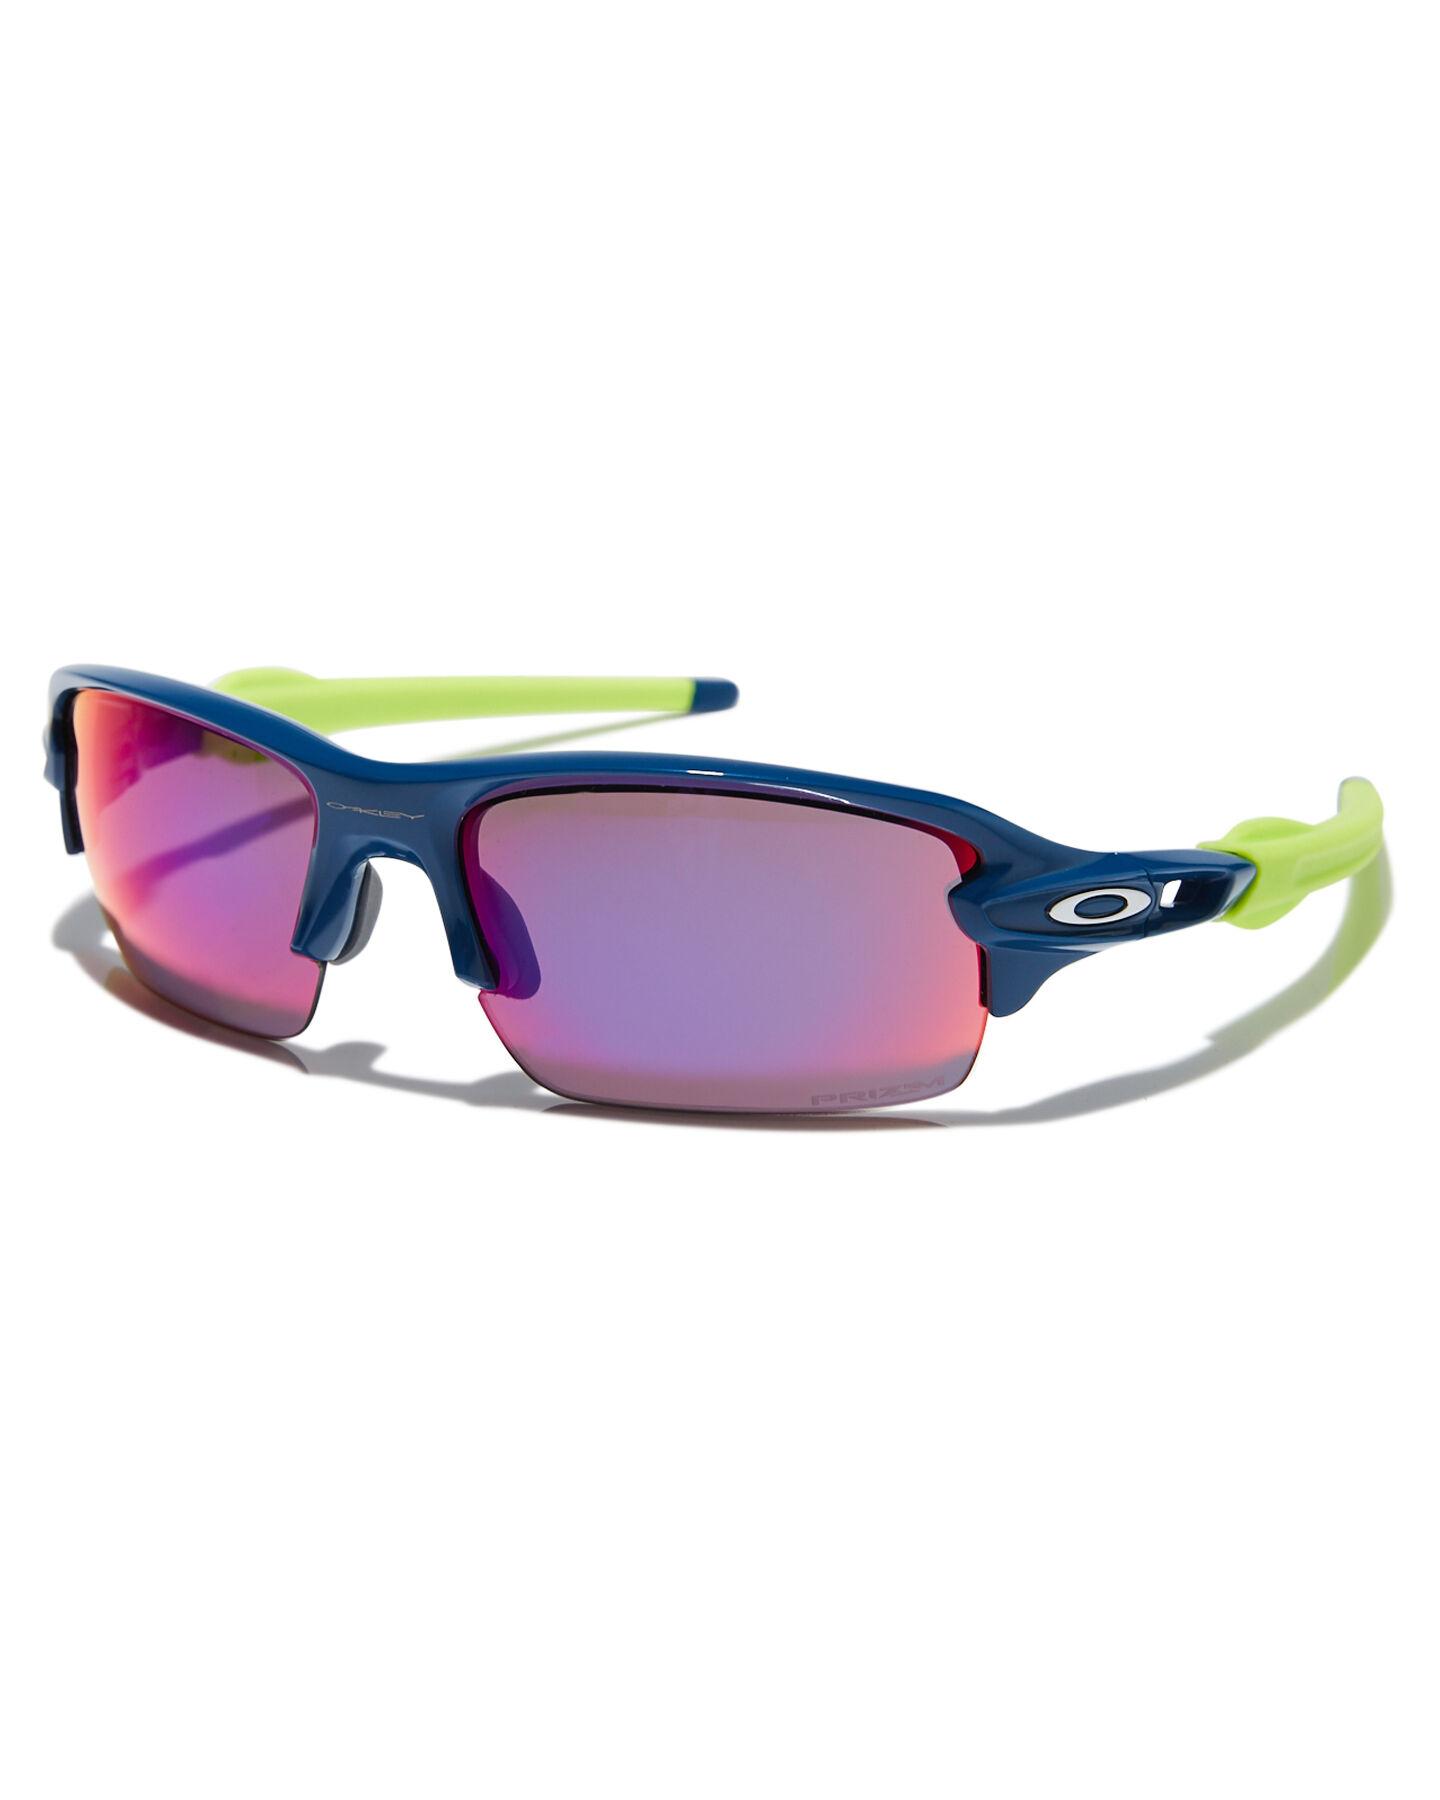 00e9d31b8f ... buy poseidon prizm road kids boys oakley sunglasses 0oj9005 0559 25e45  5dd1c